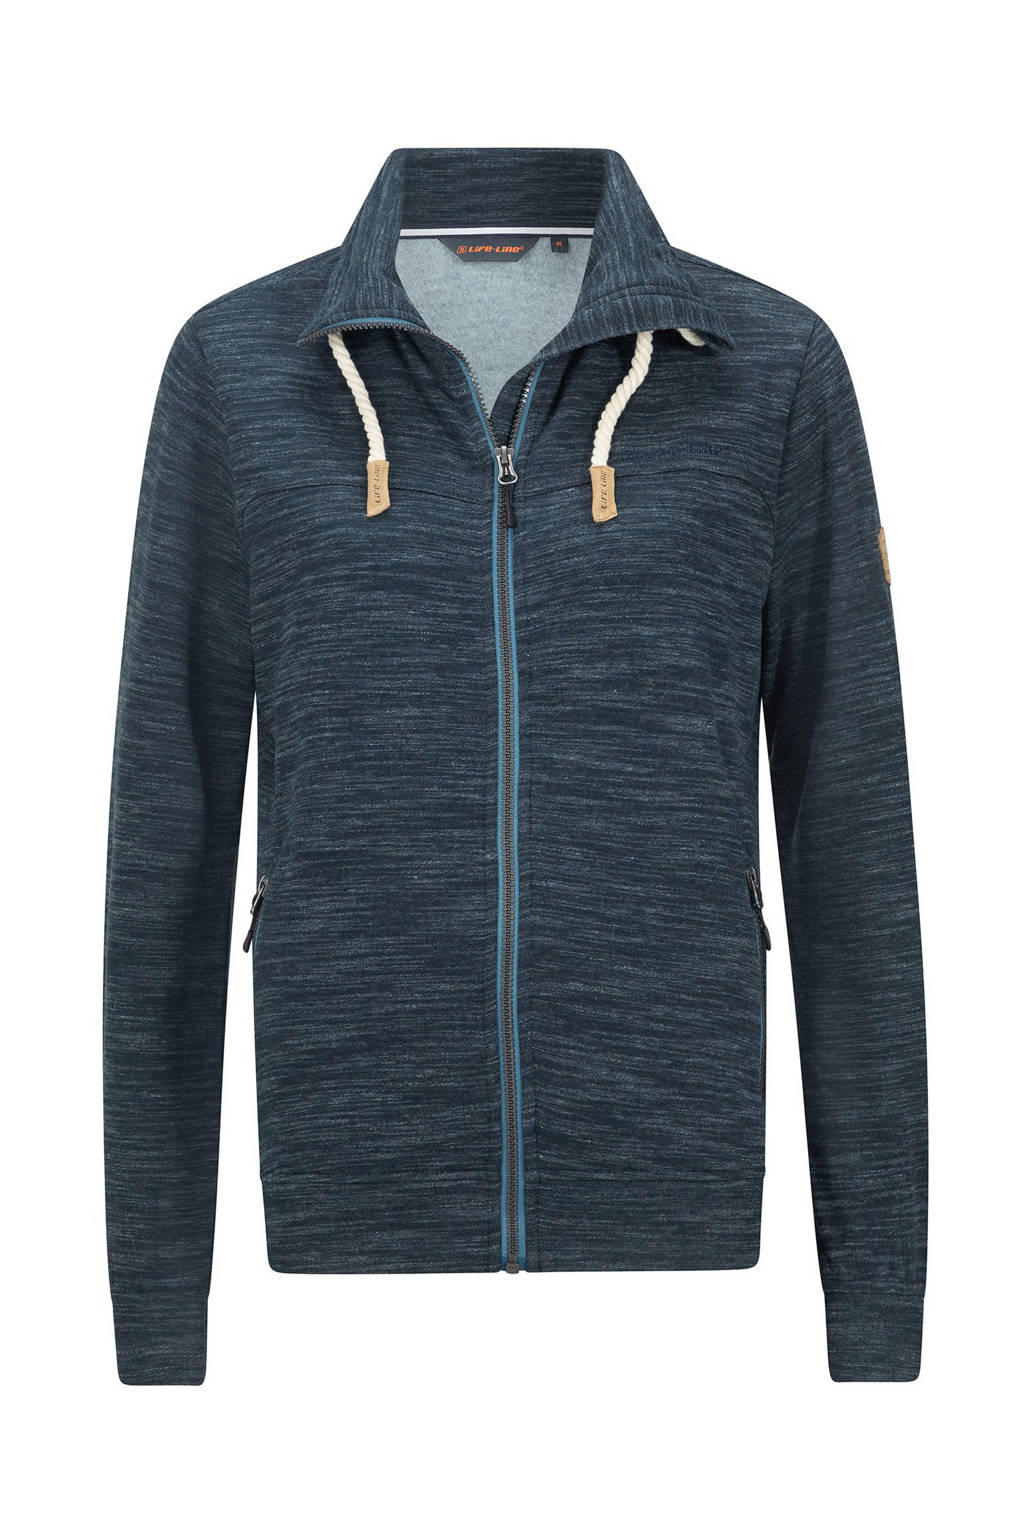 Life-Line outdoor vest Sandy donkerblauw melange, Donkerblauw melange